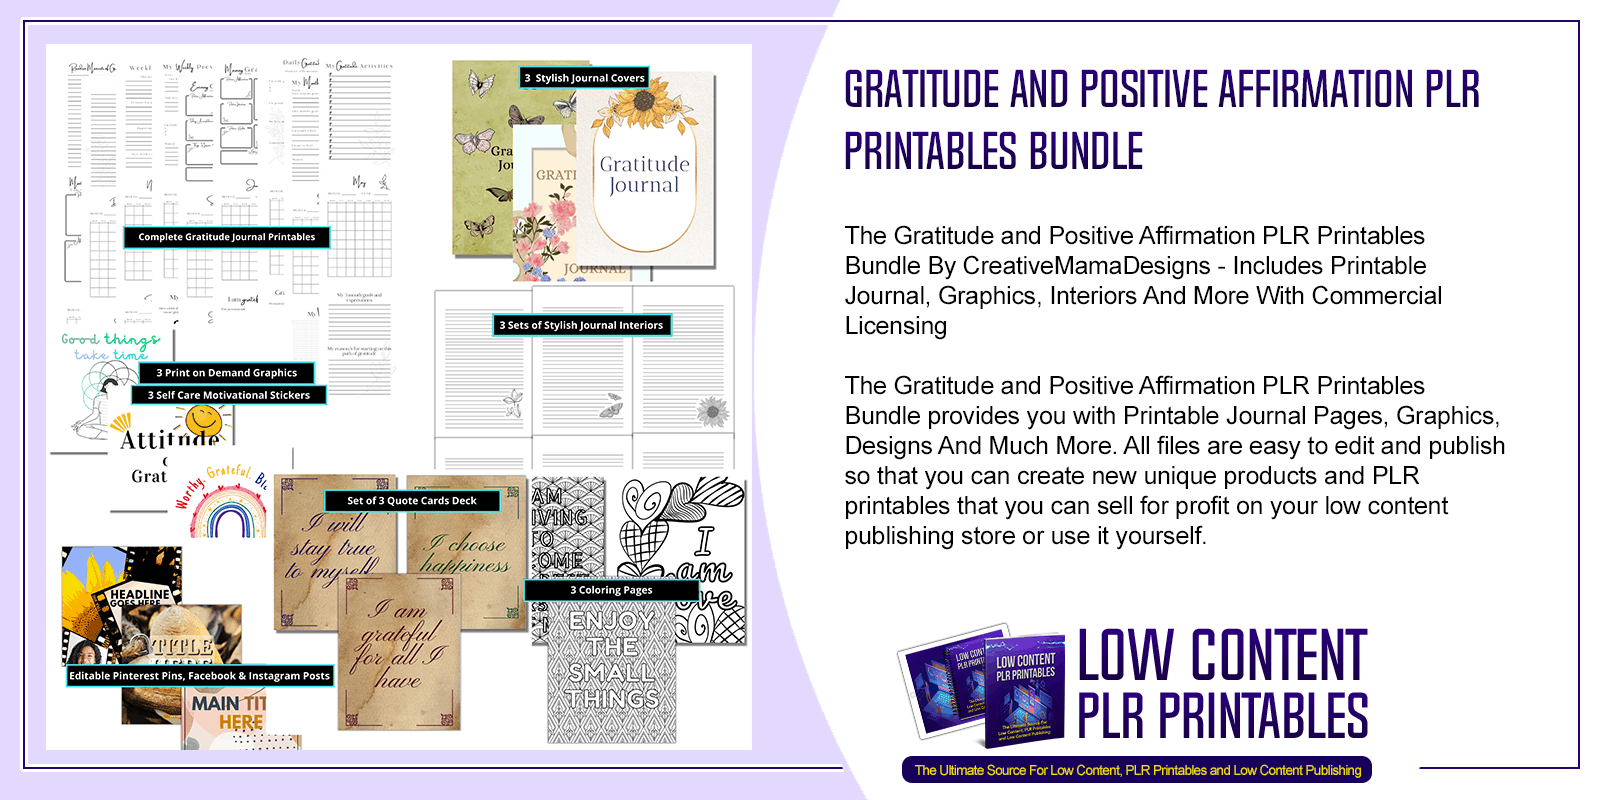 Gratitude and Positive Affirmation PLR Printables Bundle